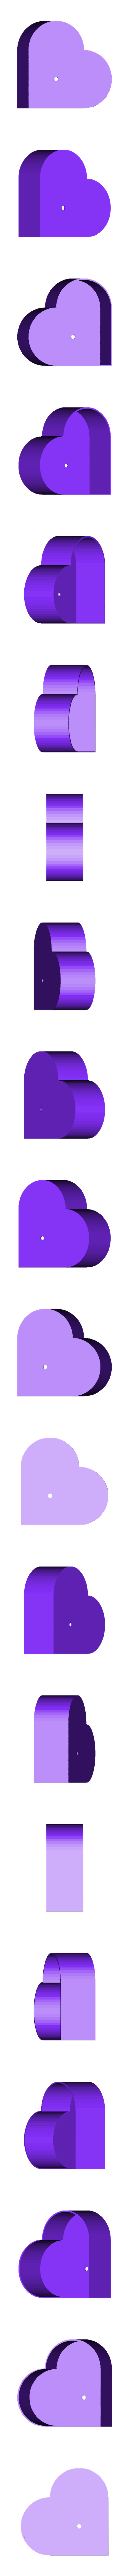 heart_planter.stl Download free SCAD file Heart planter / box • 3D print template, gillesromani